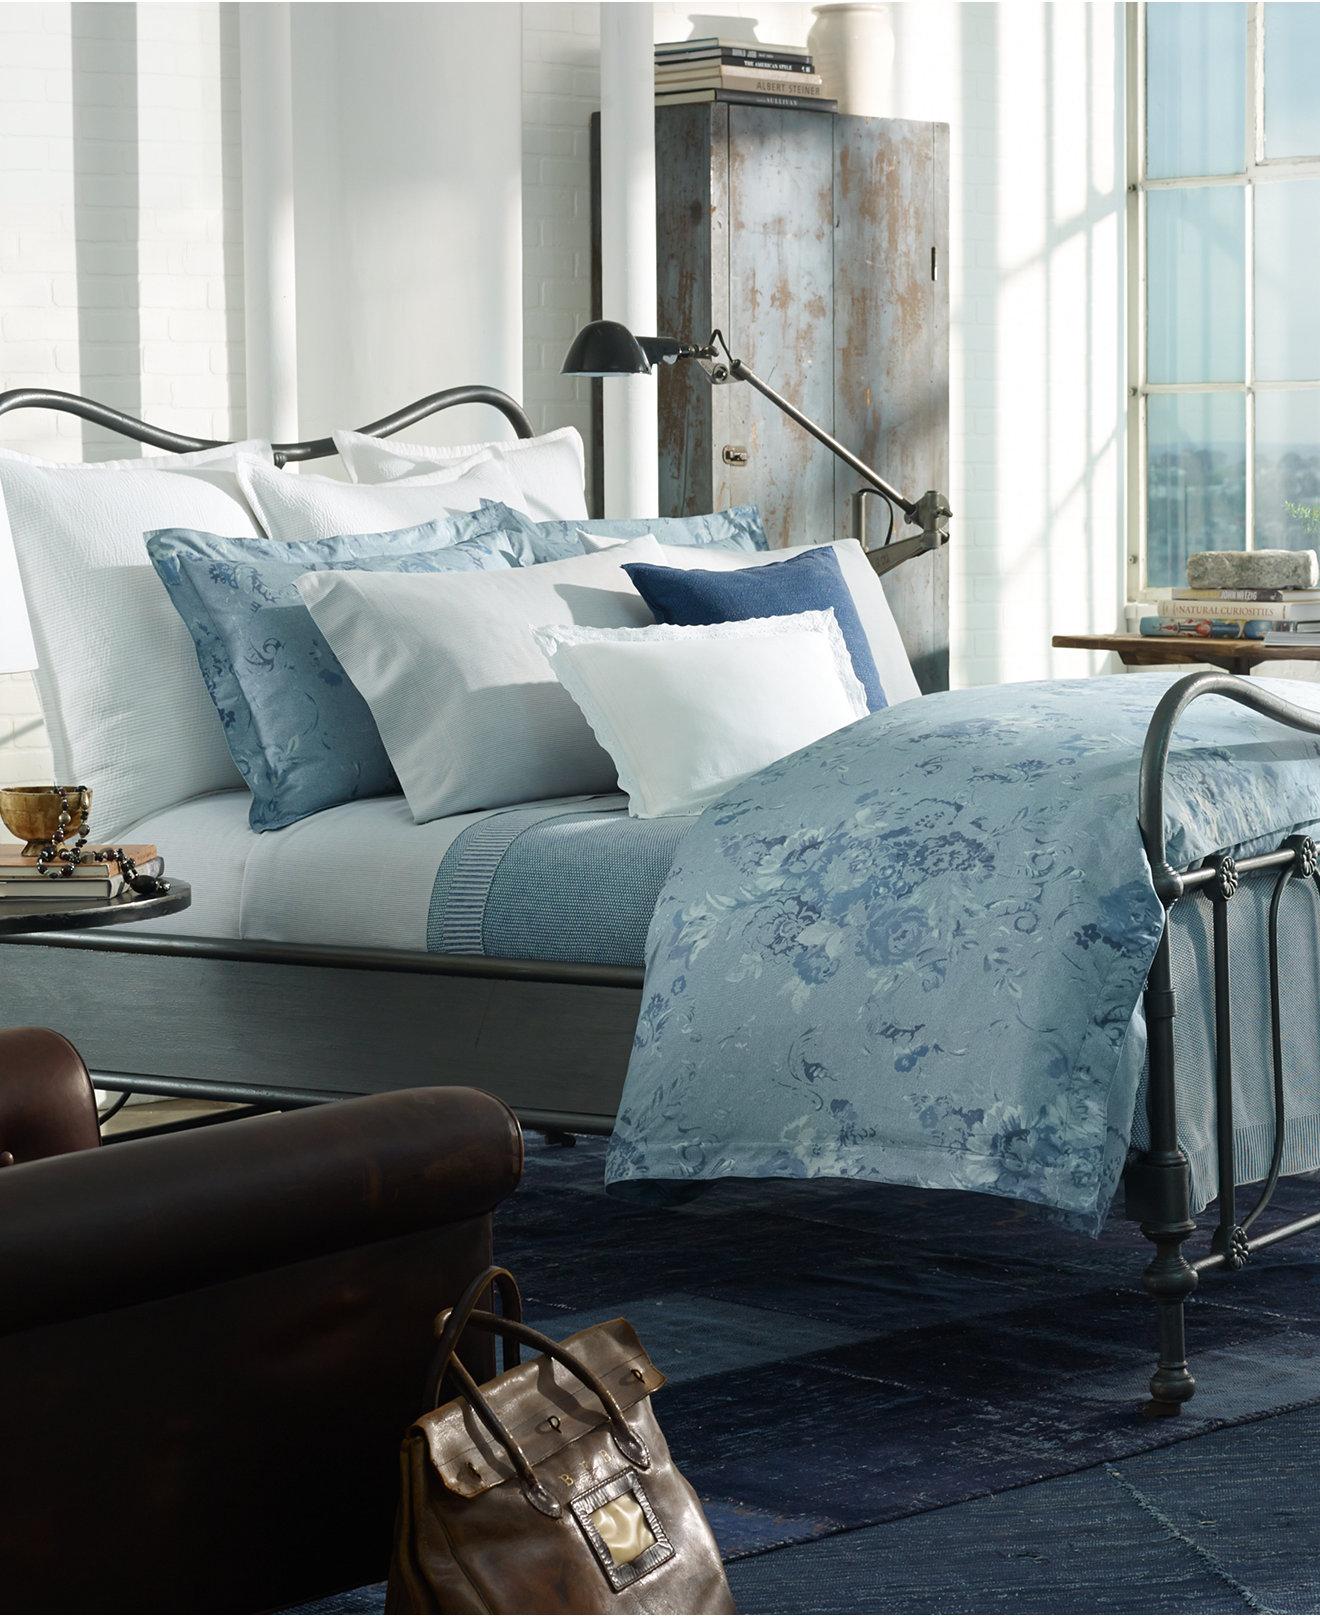 Ralph lauren polo bedding for girls - Ralph Lauren Indigo Montauk Collection Bedding Collections Bed Bath Macy S